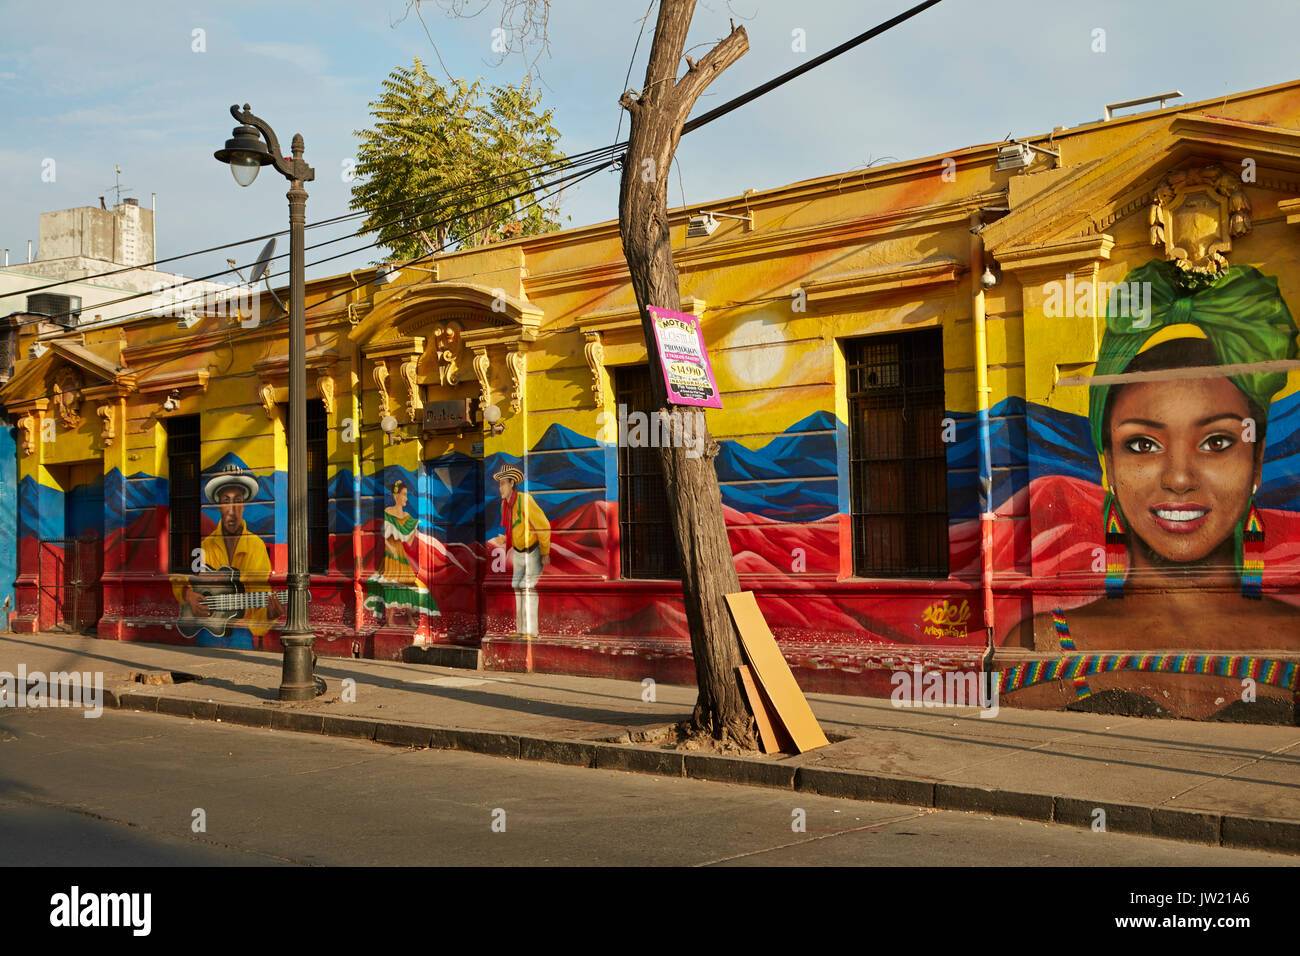 Mural, Bellavista, Santiago, Chile, South America - Stock Image